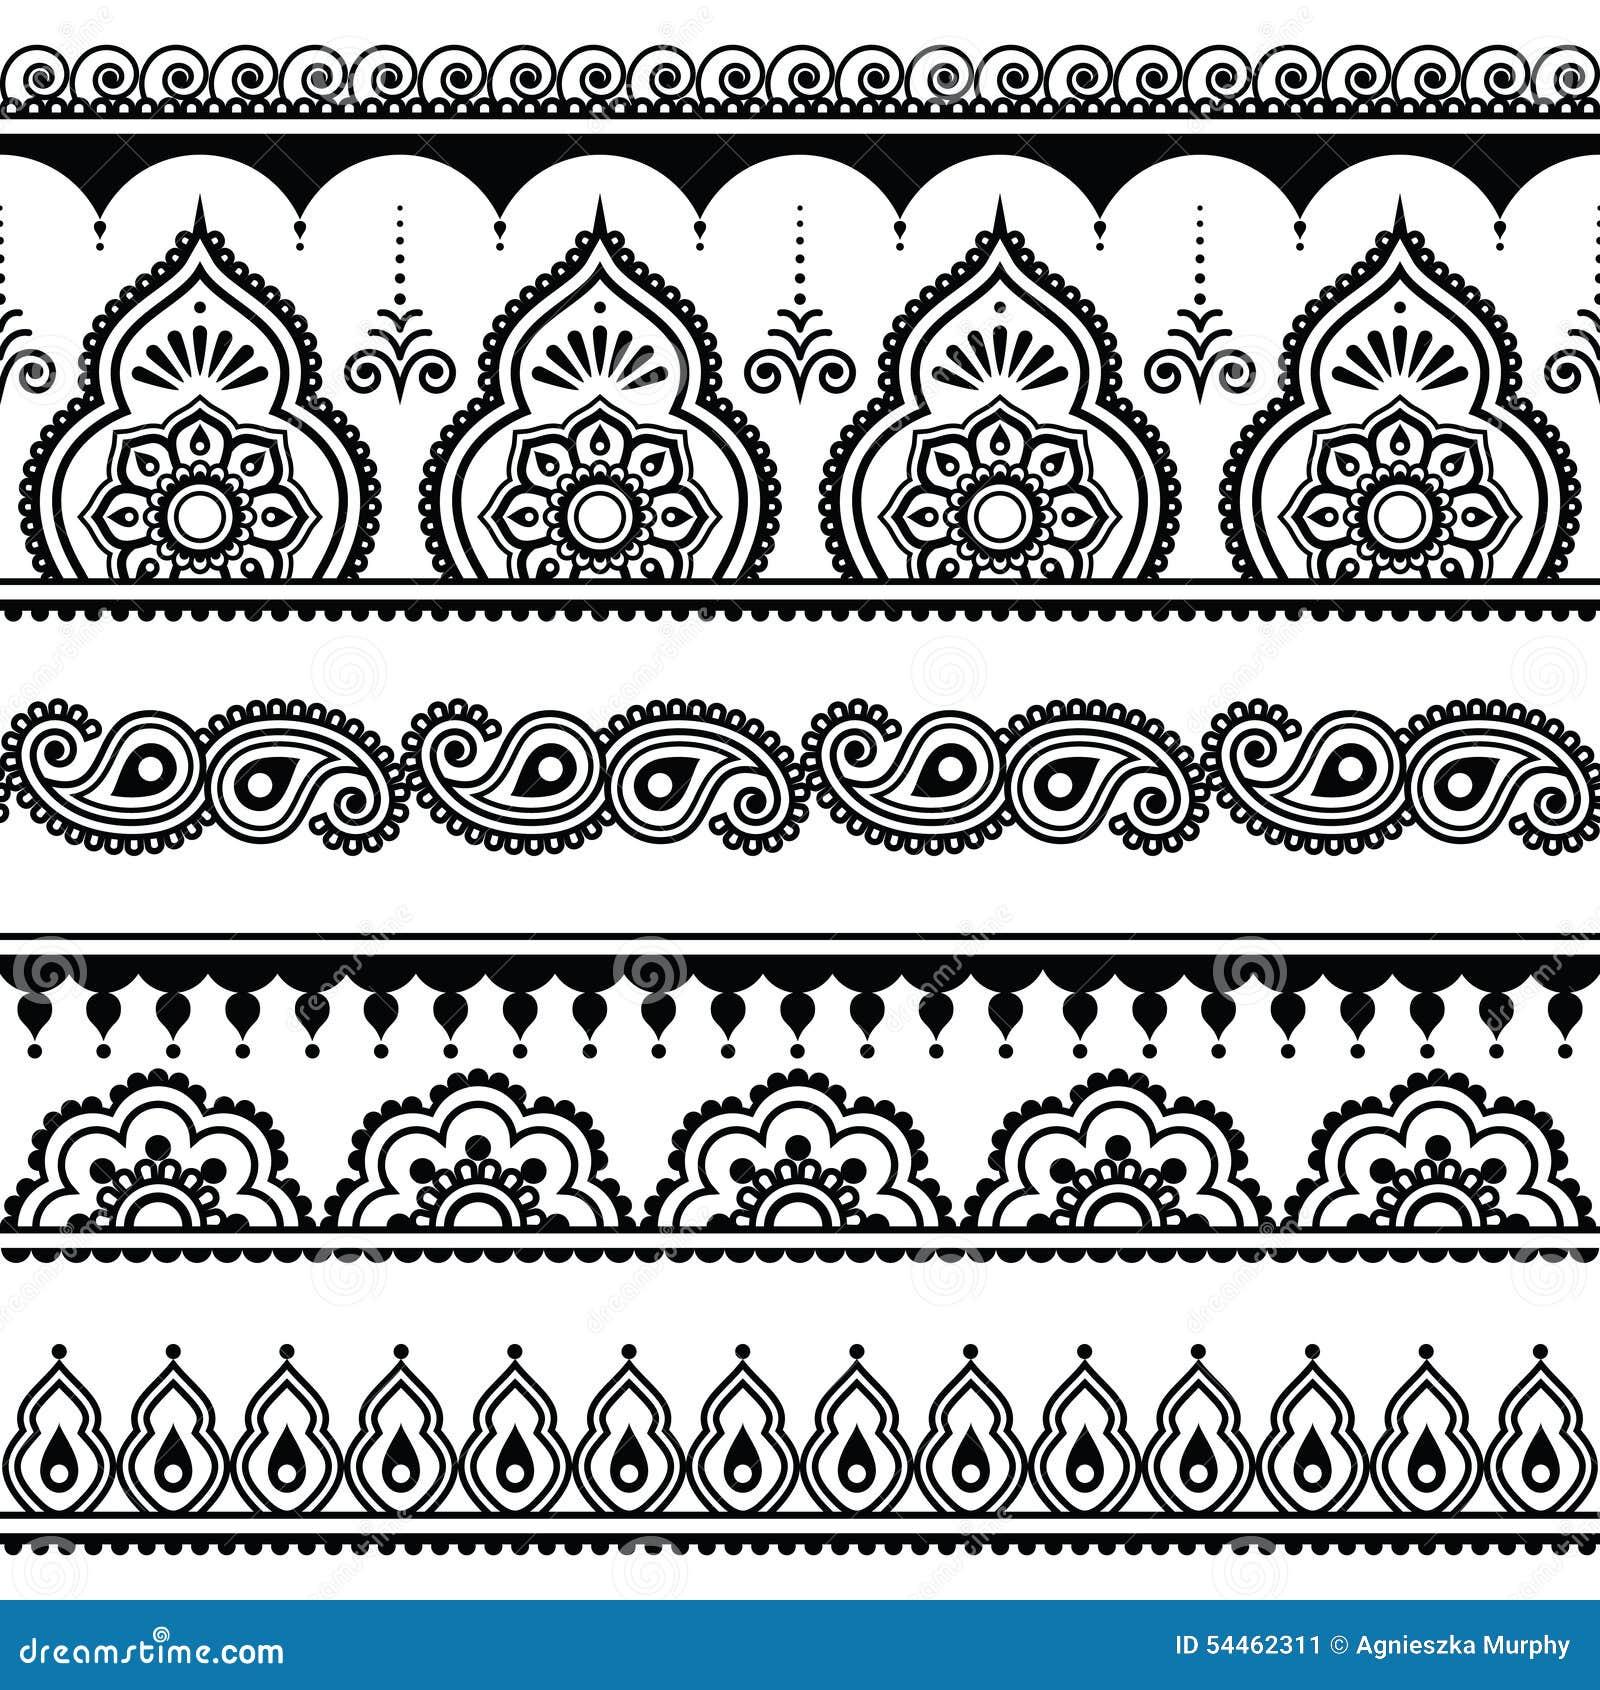 Traditional Henna Tattoo Designs: Mehndi, Indian Henna Tattoo Seamless Pattern, Design